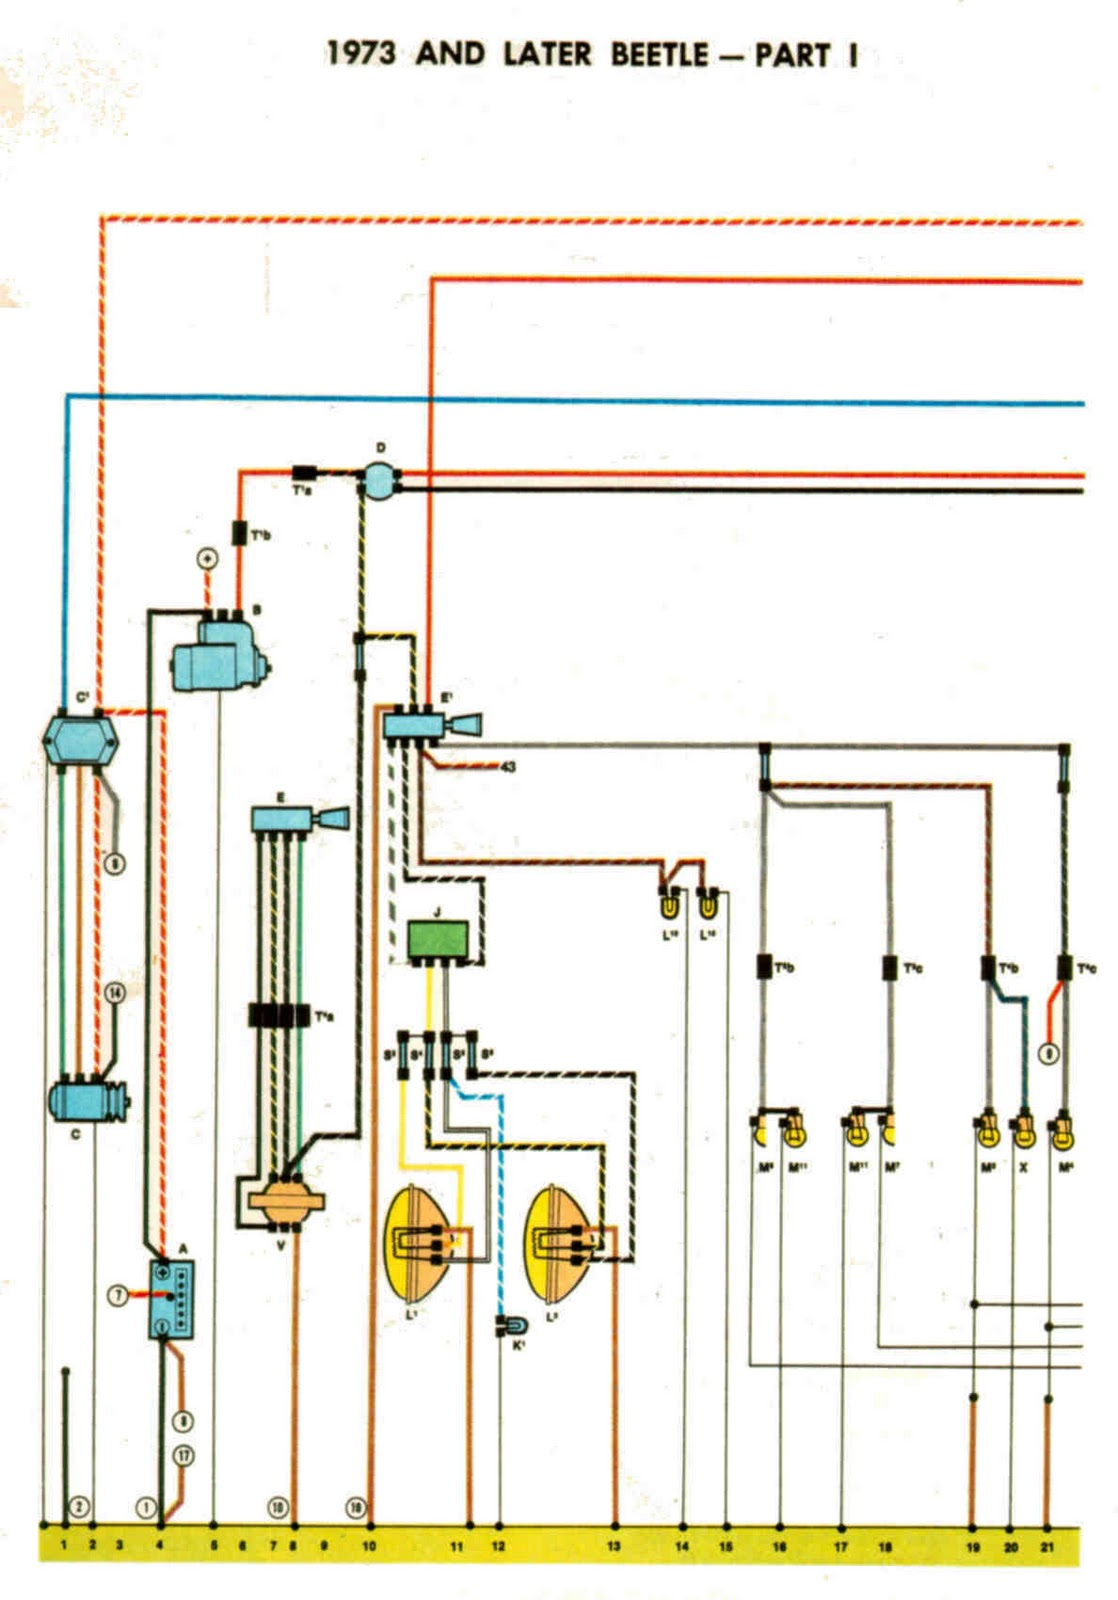 Vw Beetle Wiring Diagram 1973 Sample Visio Network Get Free Image About